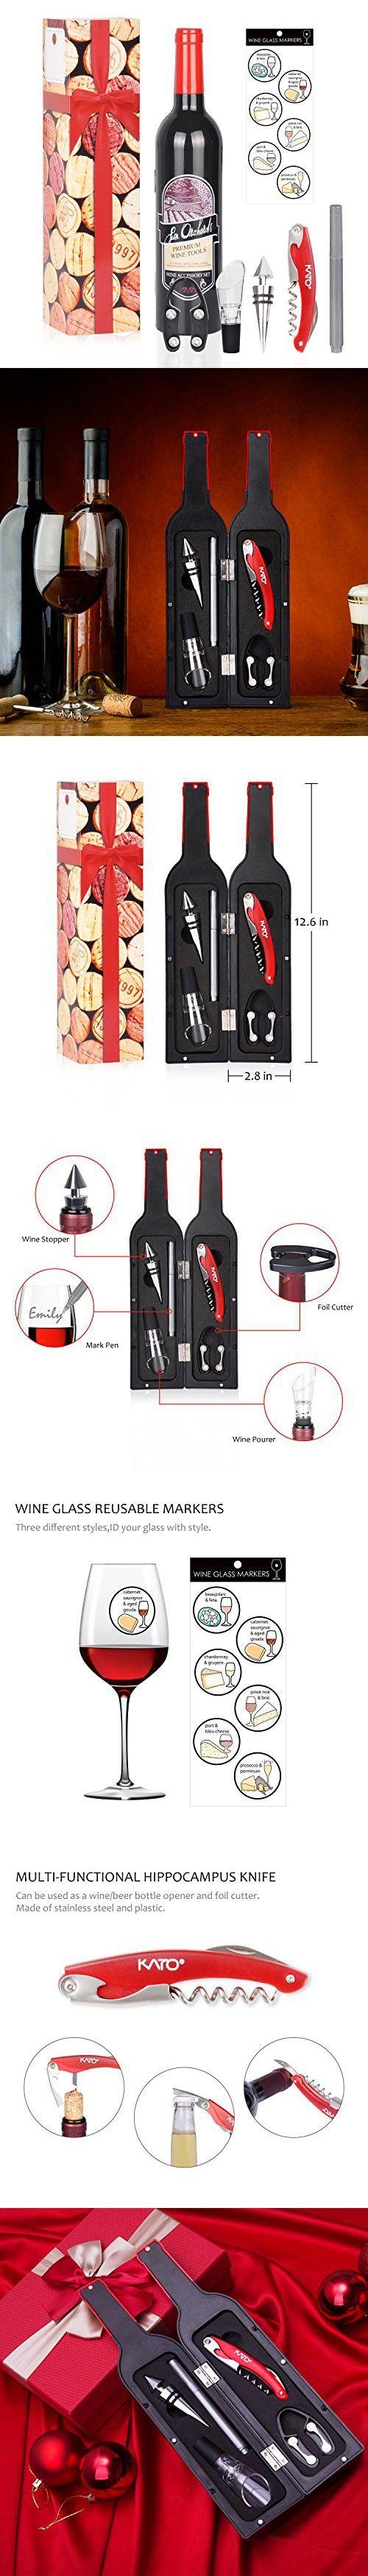 Wine Opener Accessories Gift Set - Christmas 5 Pcs Wine Bottle Corkscrew Screwpull Kit by Kato, Best Wedding Birthday Gifts for Wine Lover, Red